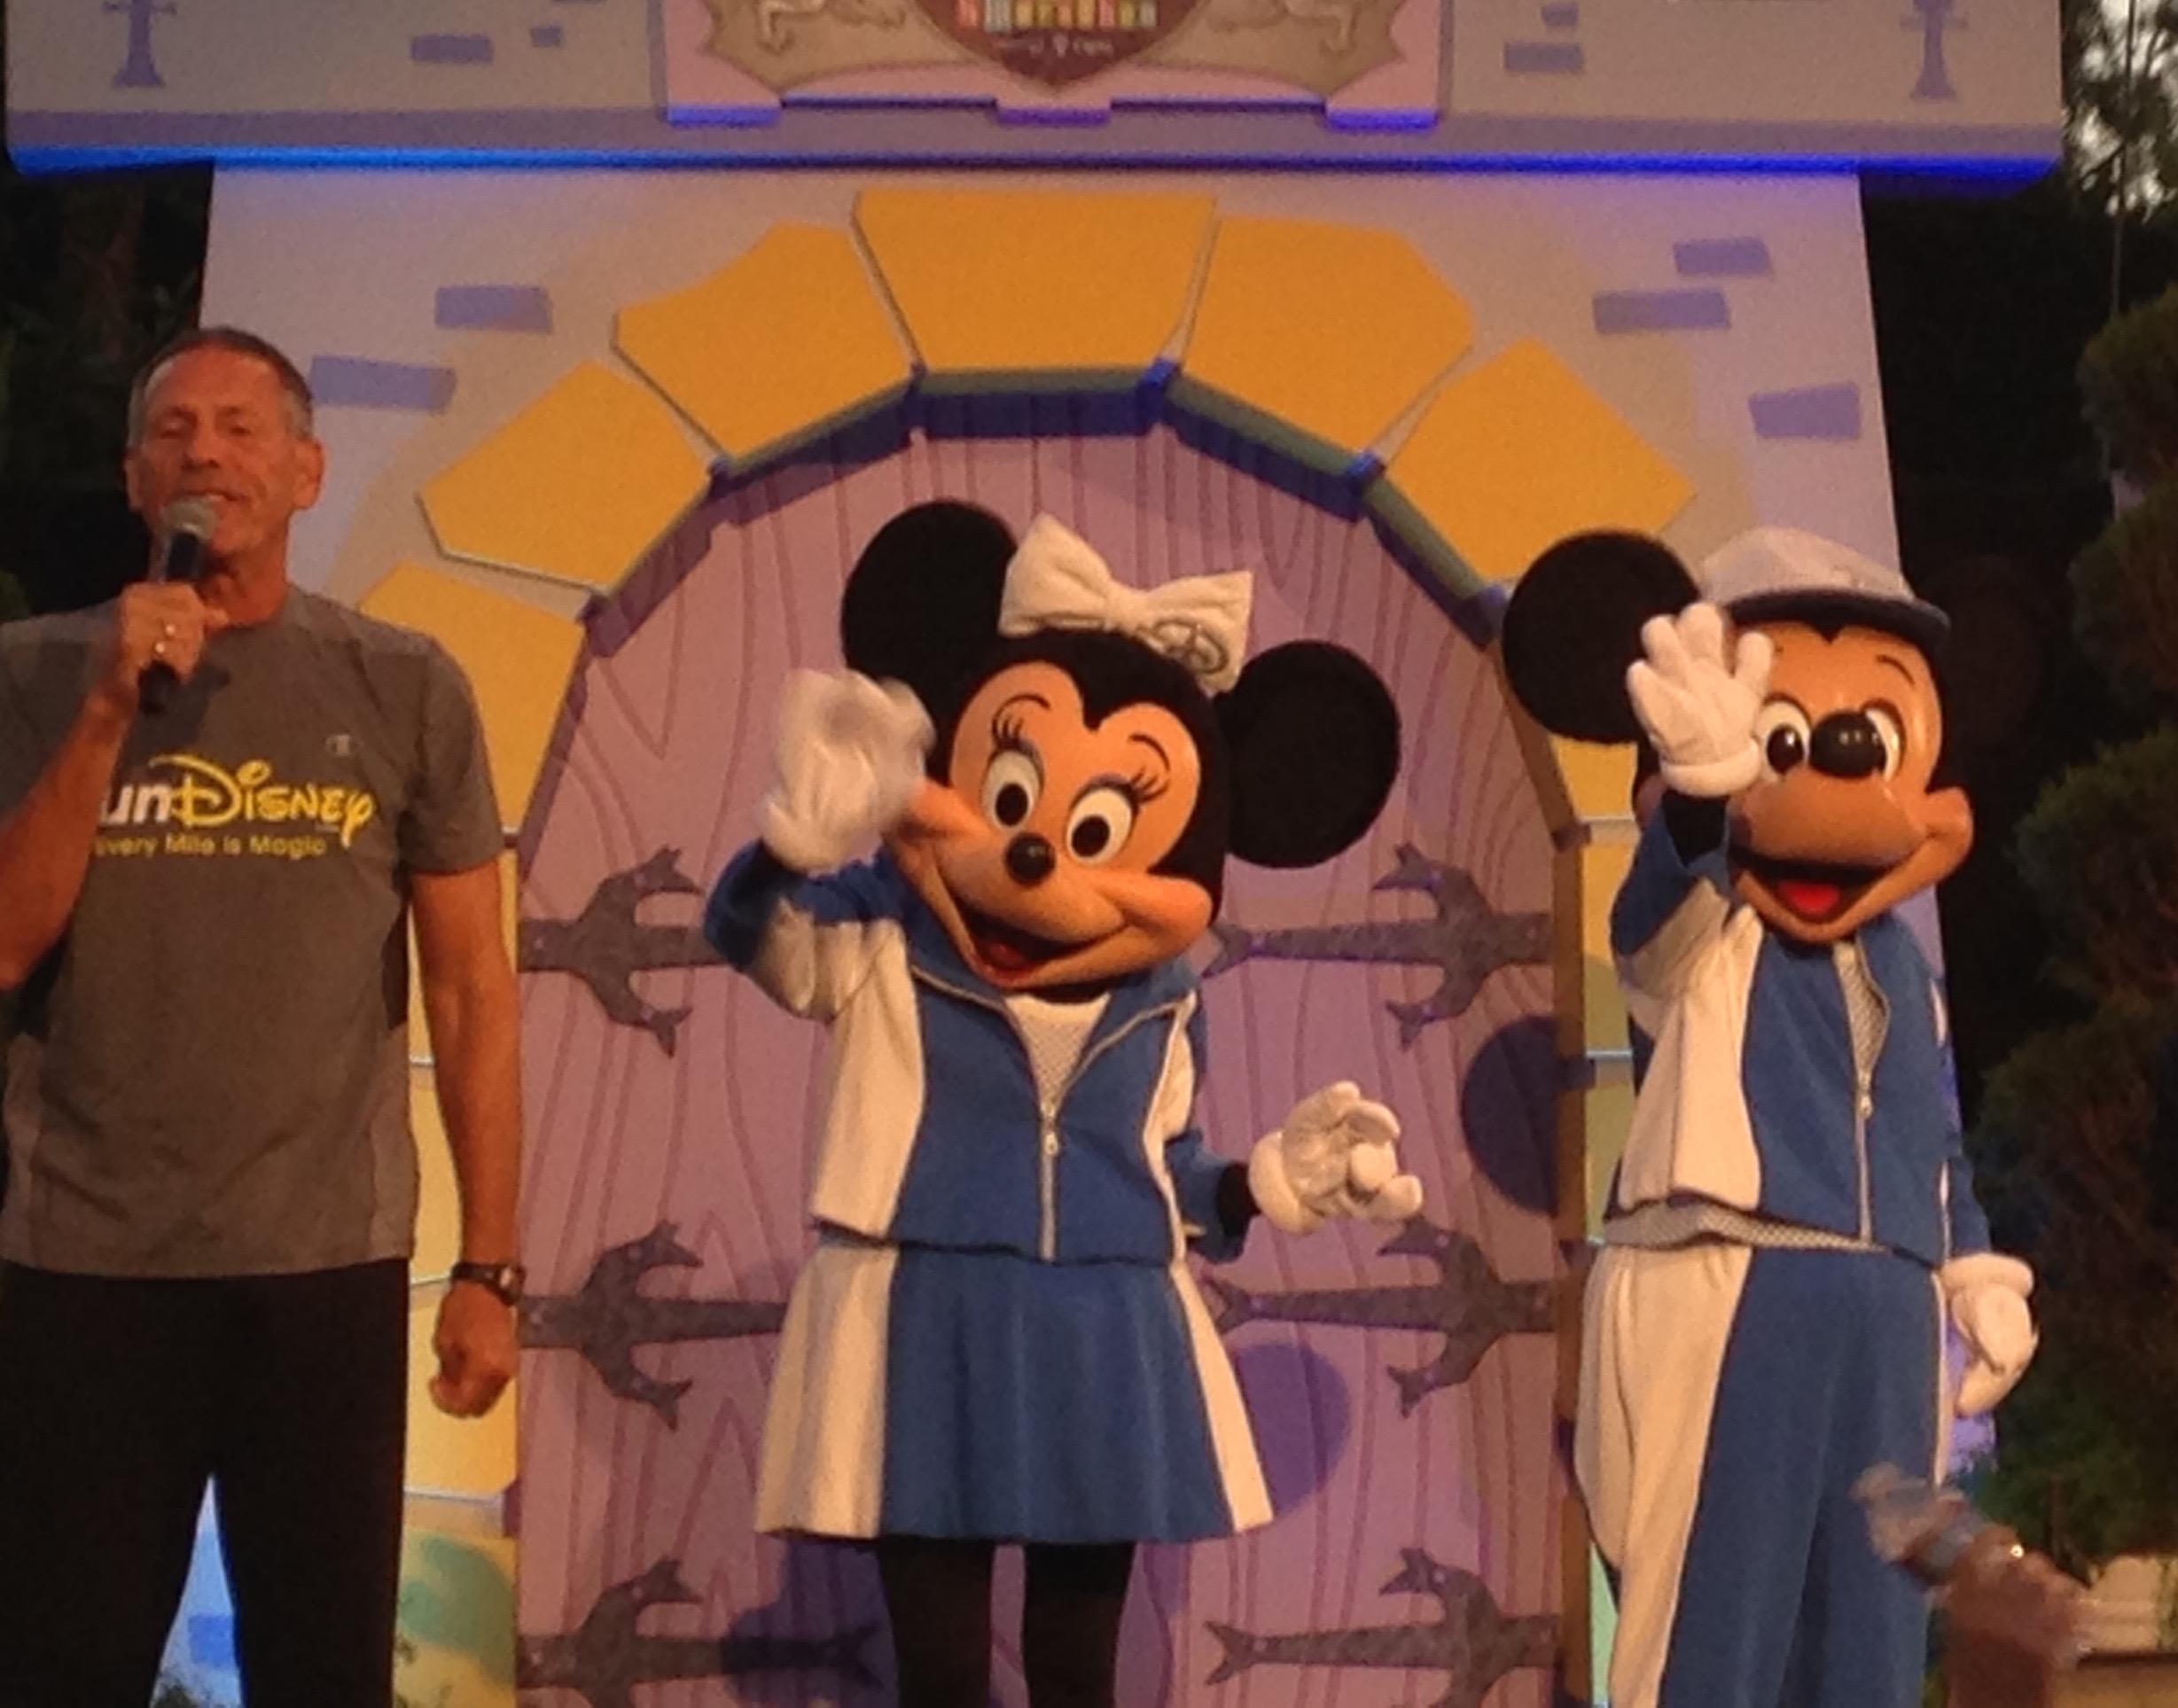 Mickey and Minnie at the start, Disneyland Half Marathon